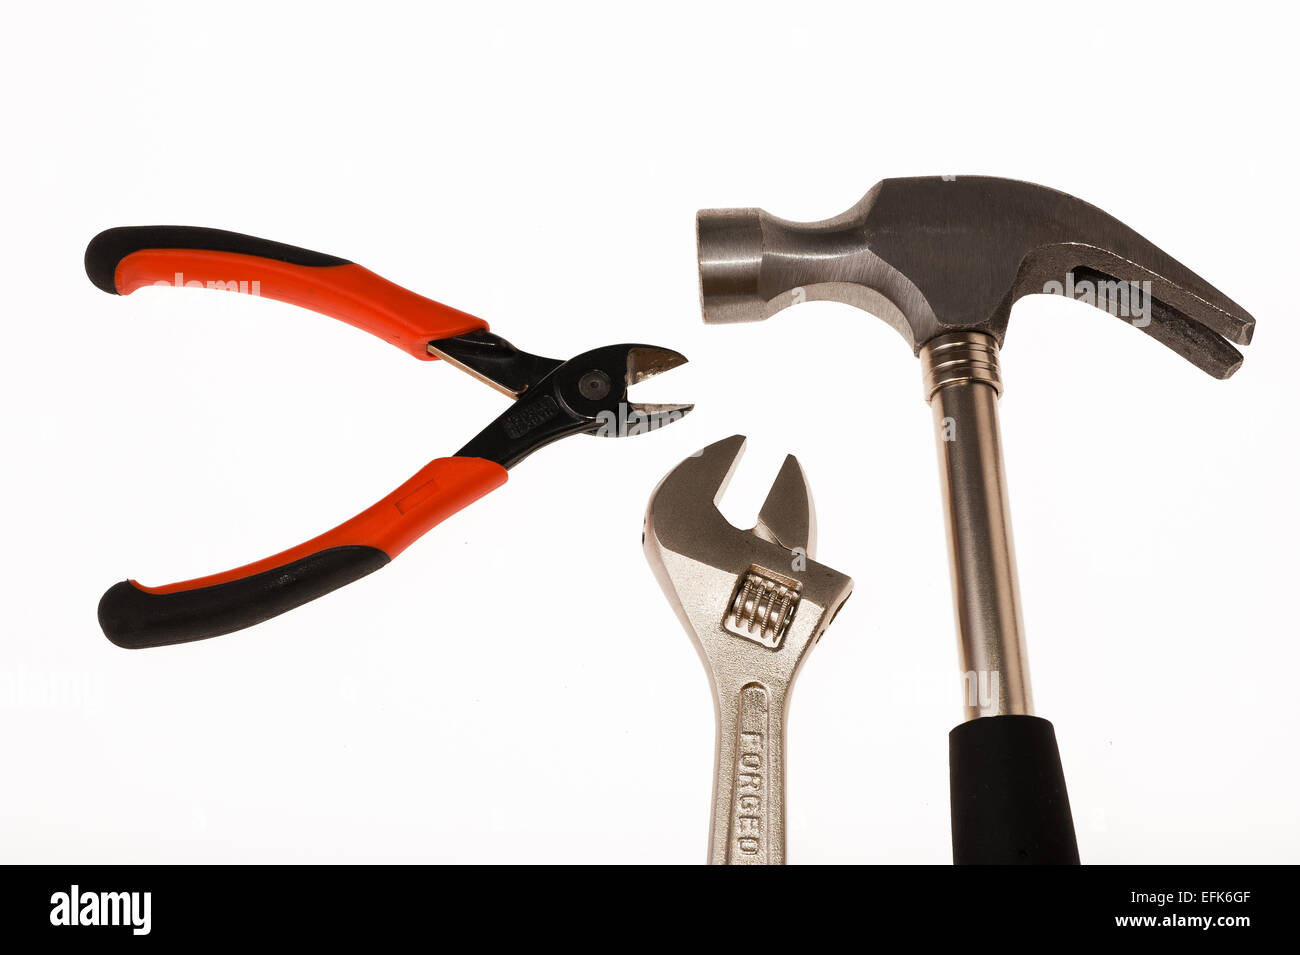 Bricolage tools on white background - Stock Image